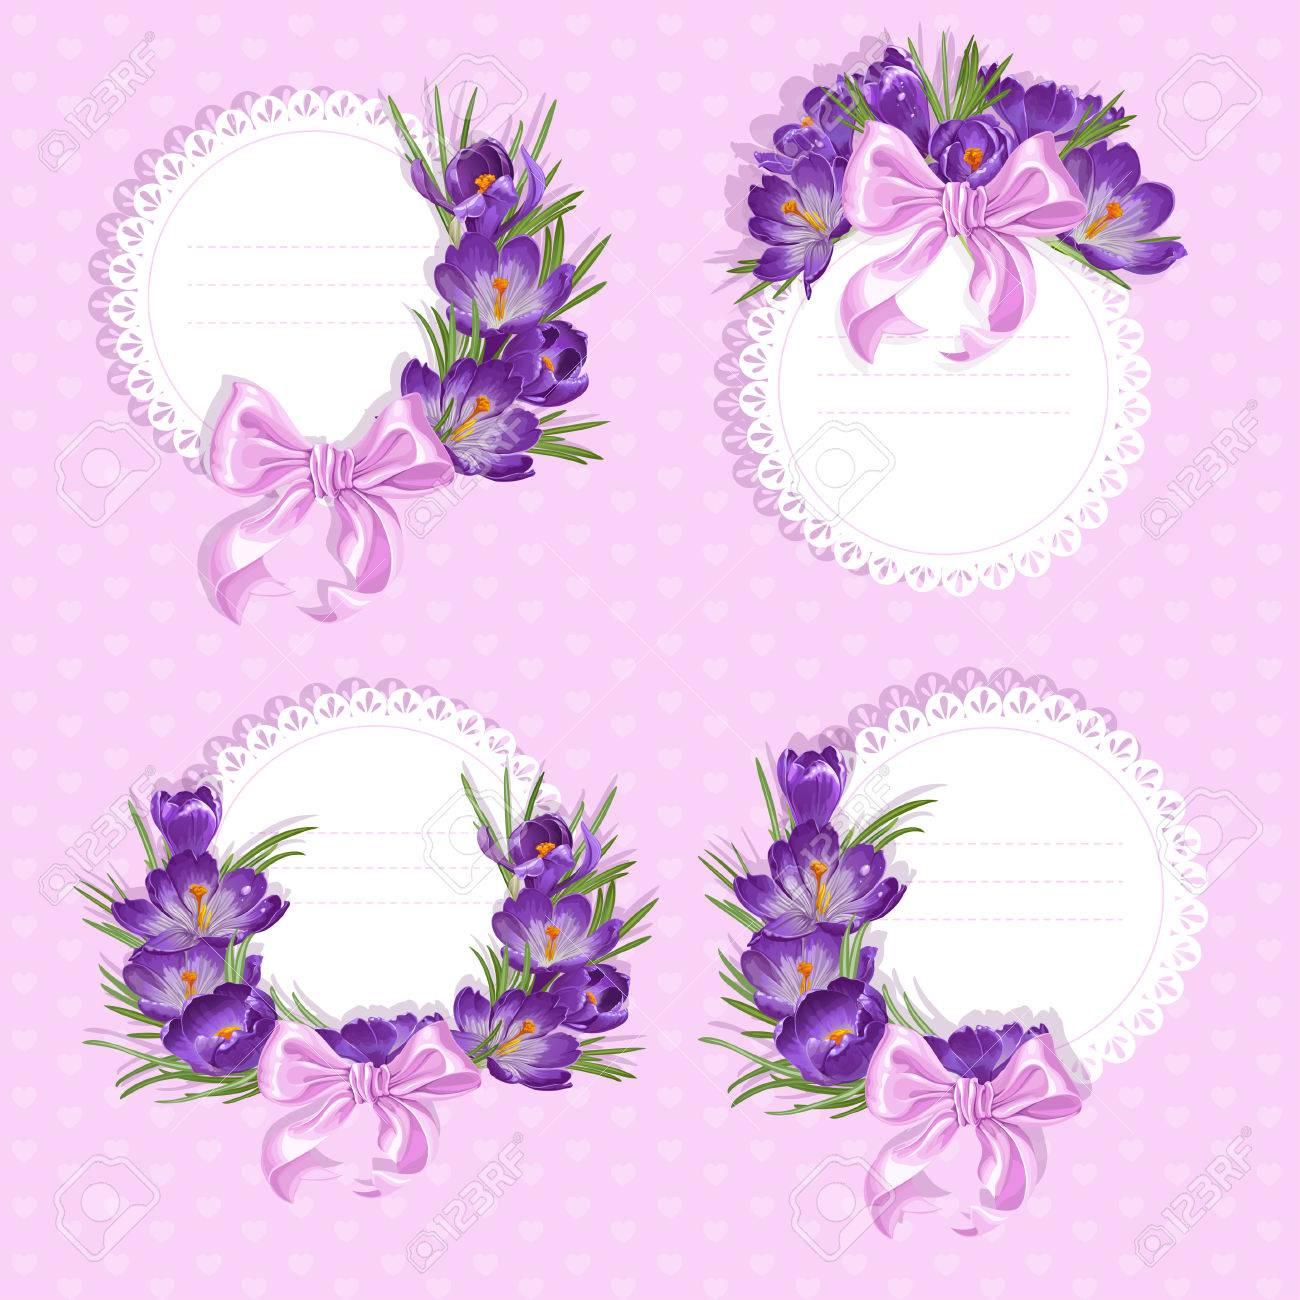 labels with purple crocus